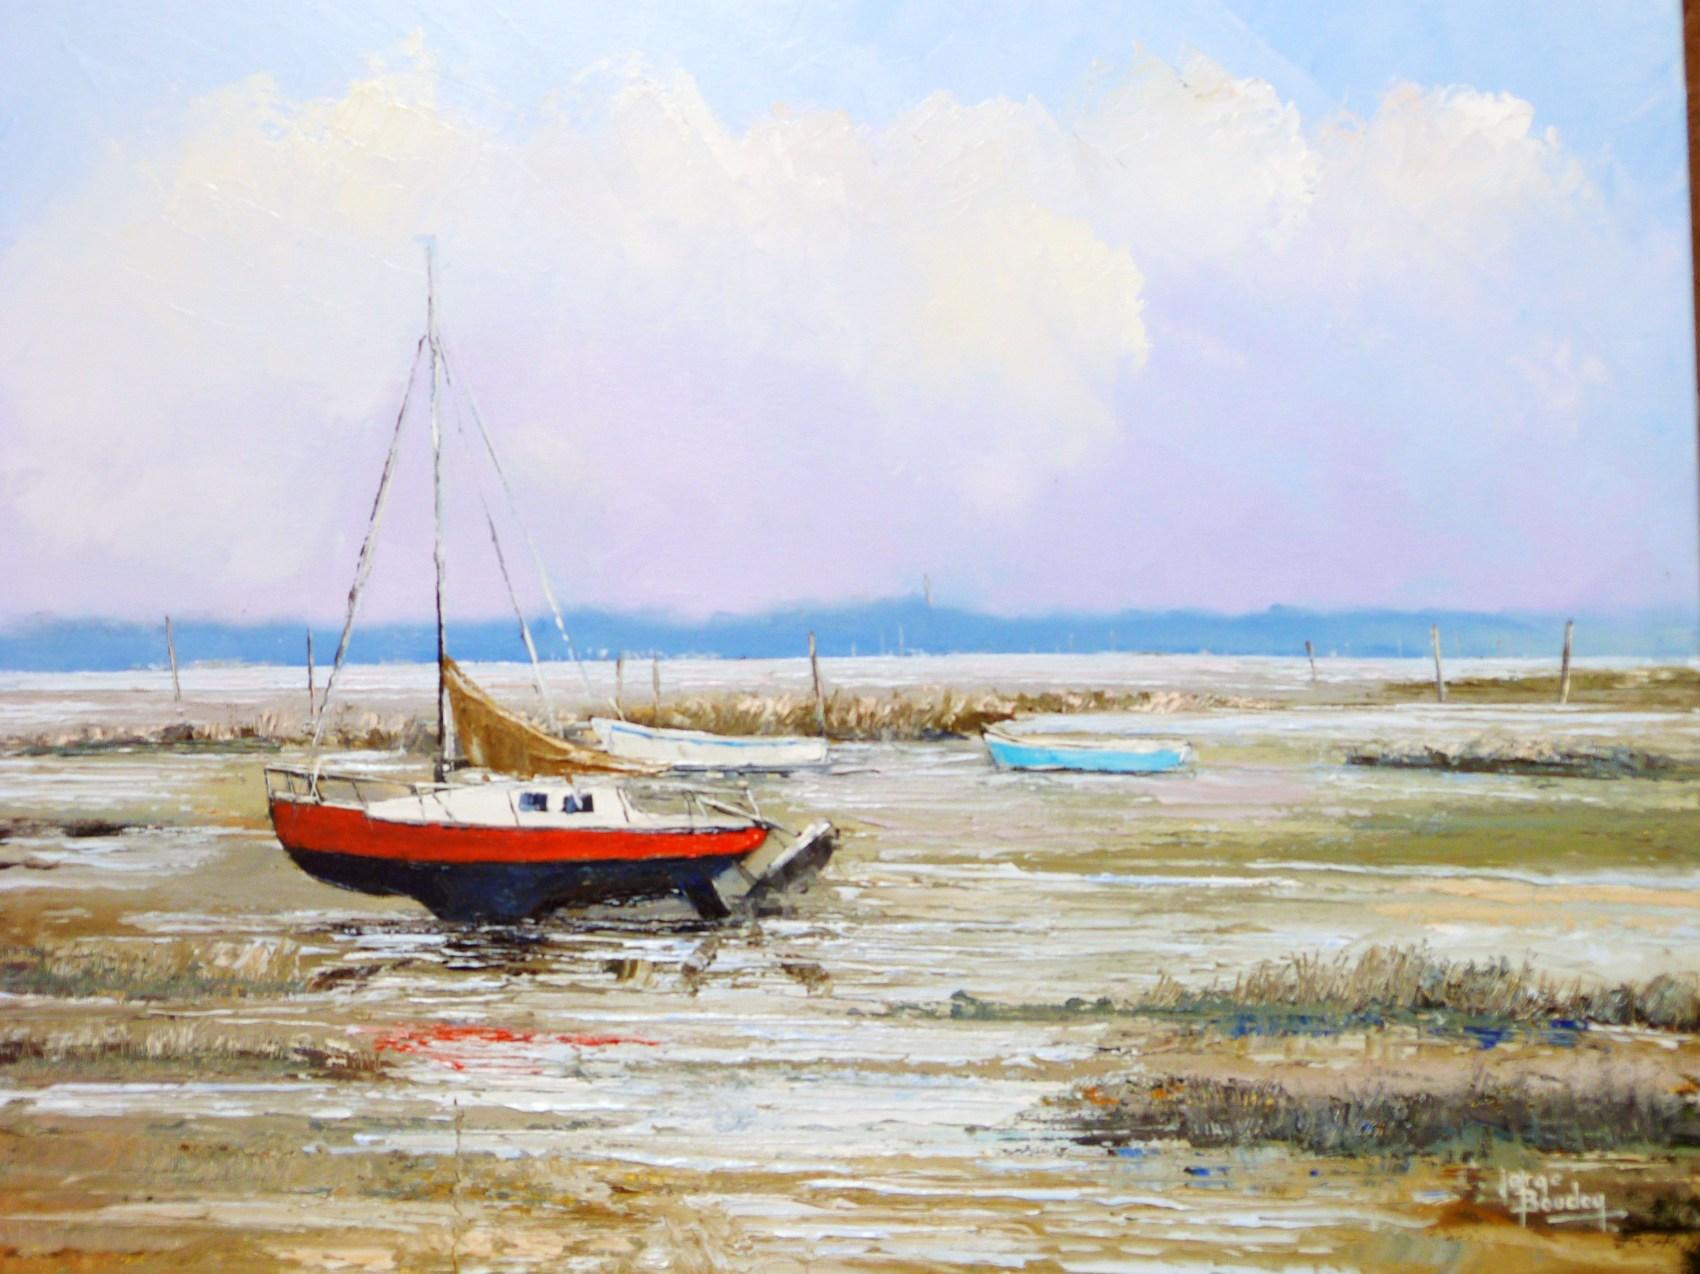 Peinture fond de bassin mar e basse huile sur toile for Toile a bassin